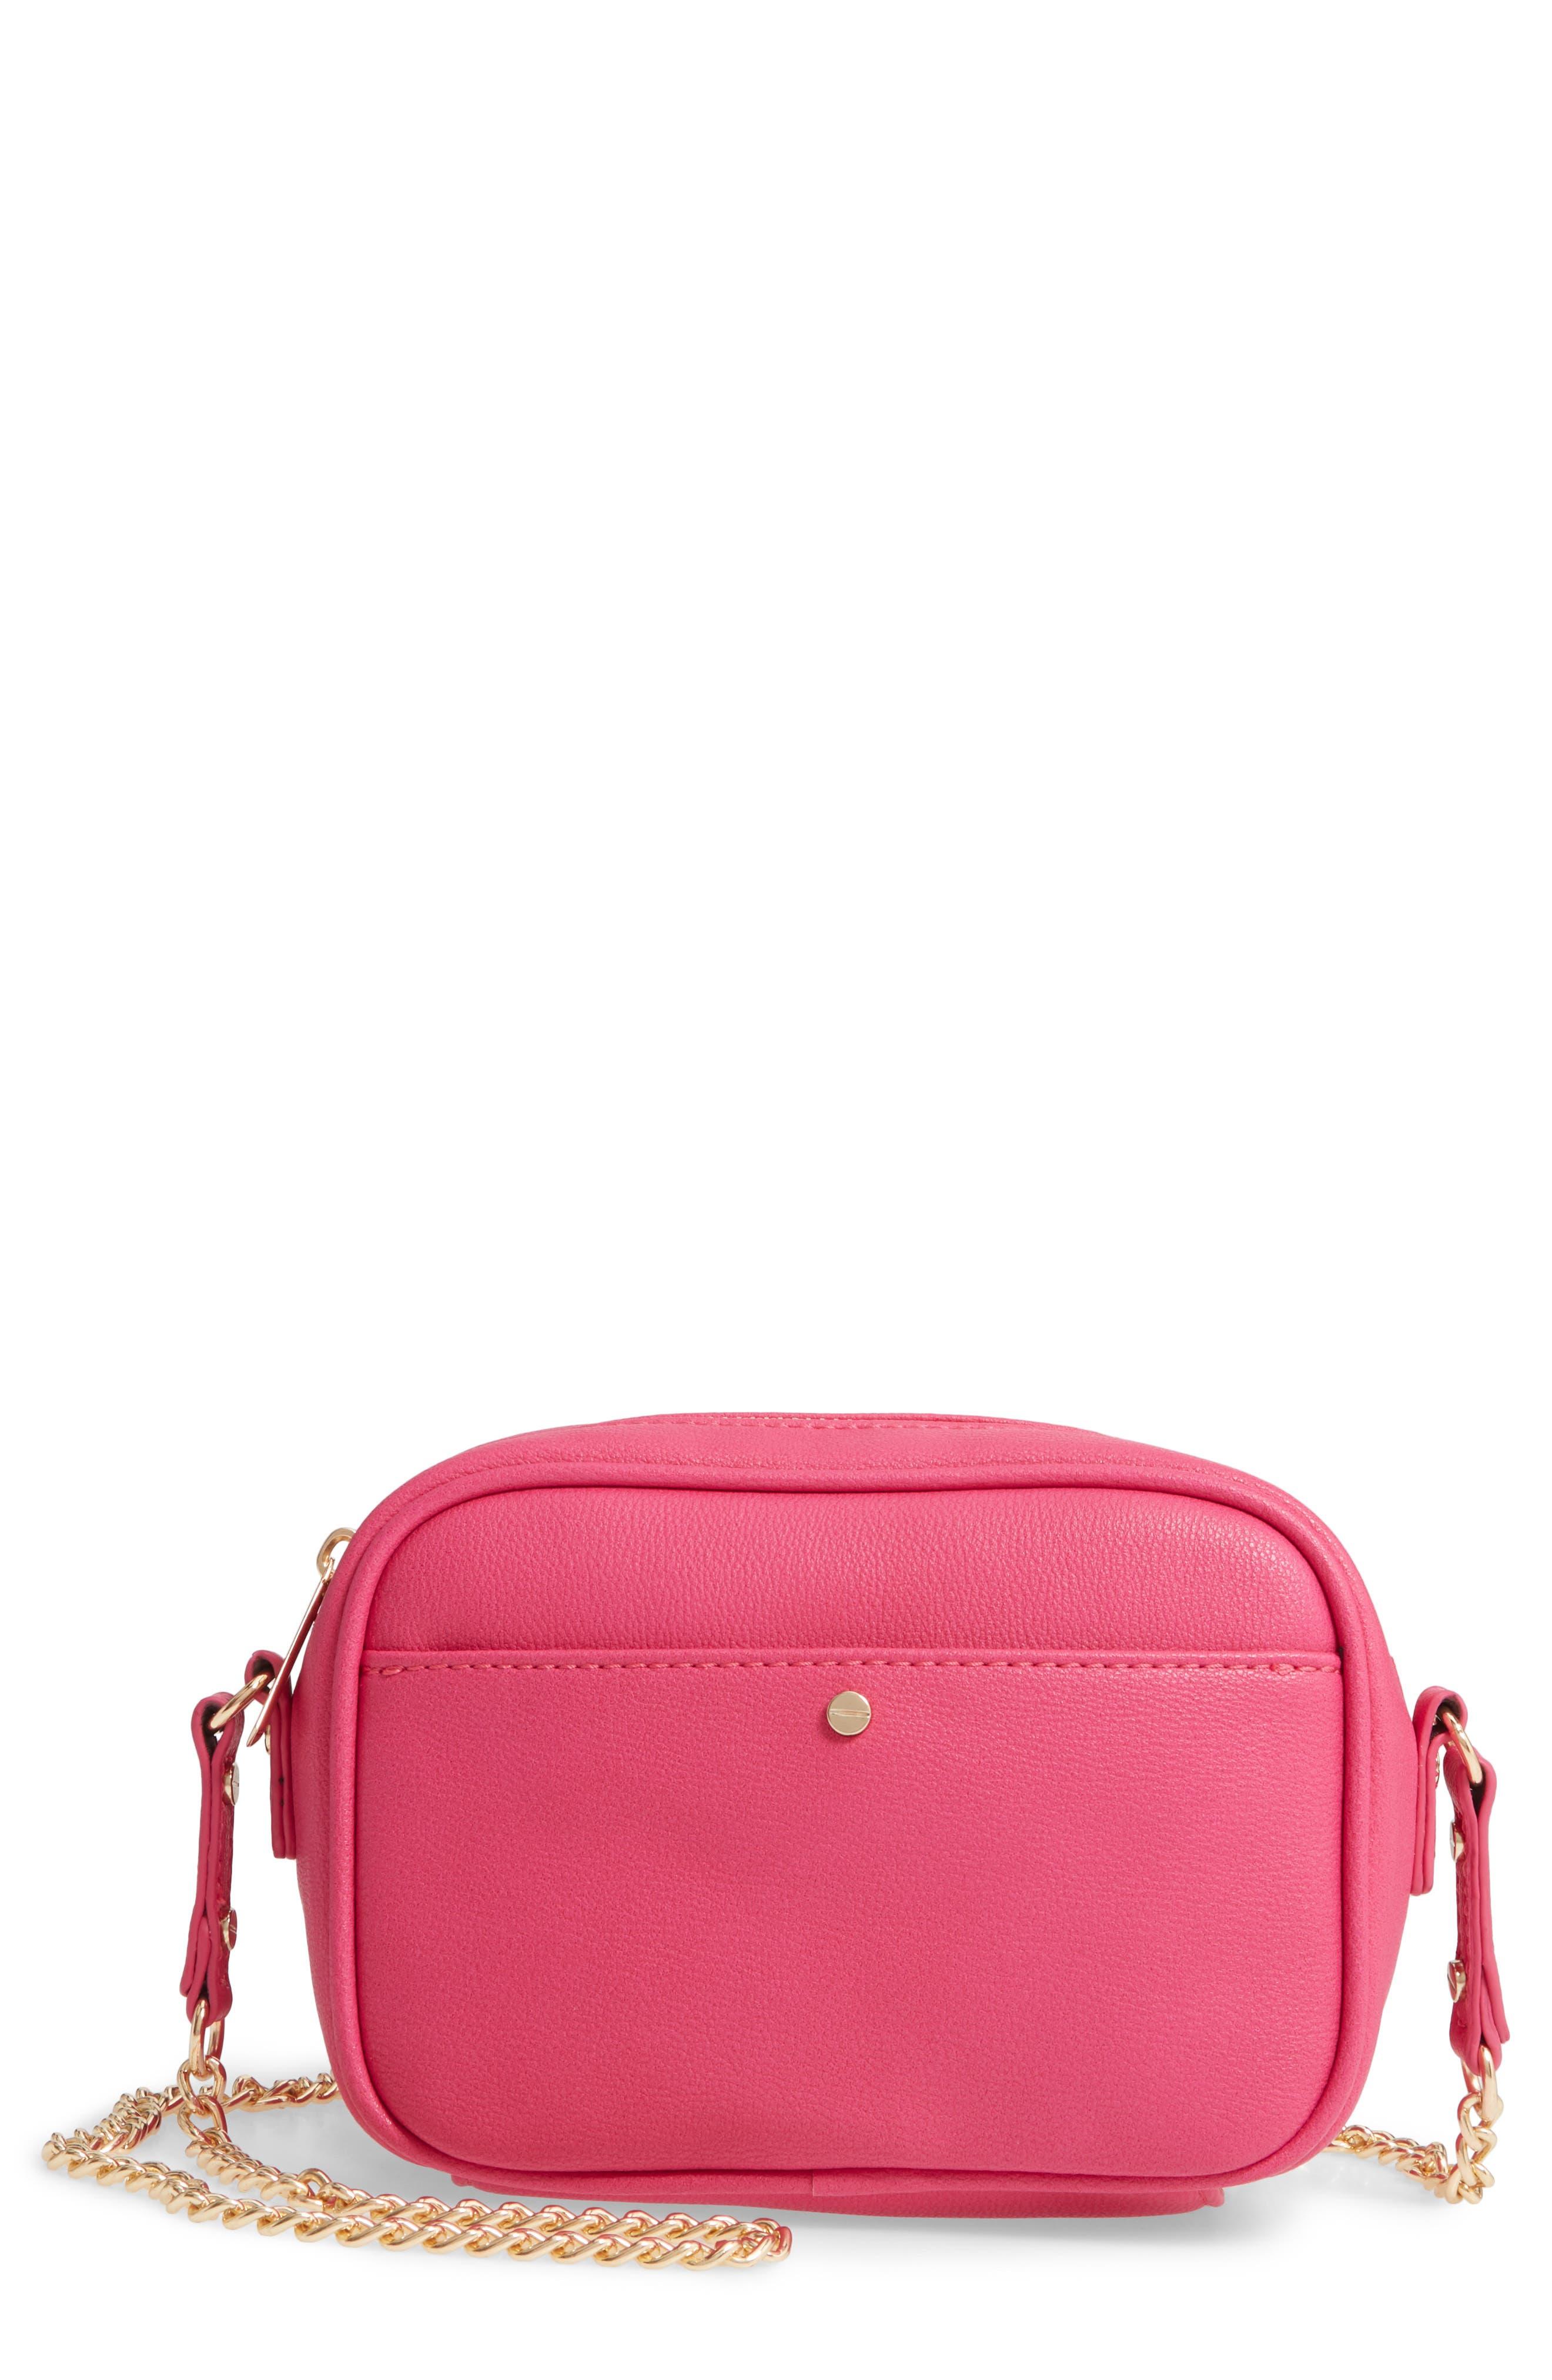 Mali + Lili Vegan Leather Camera Bag